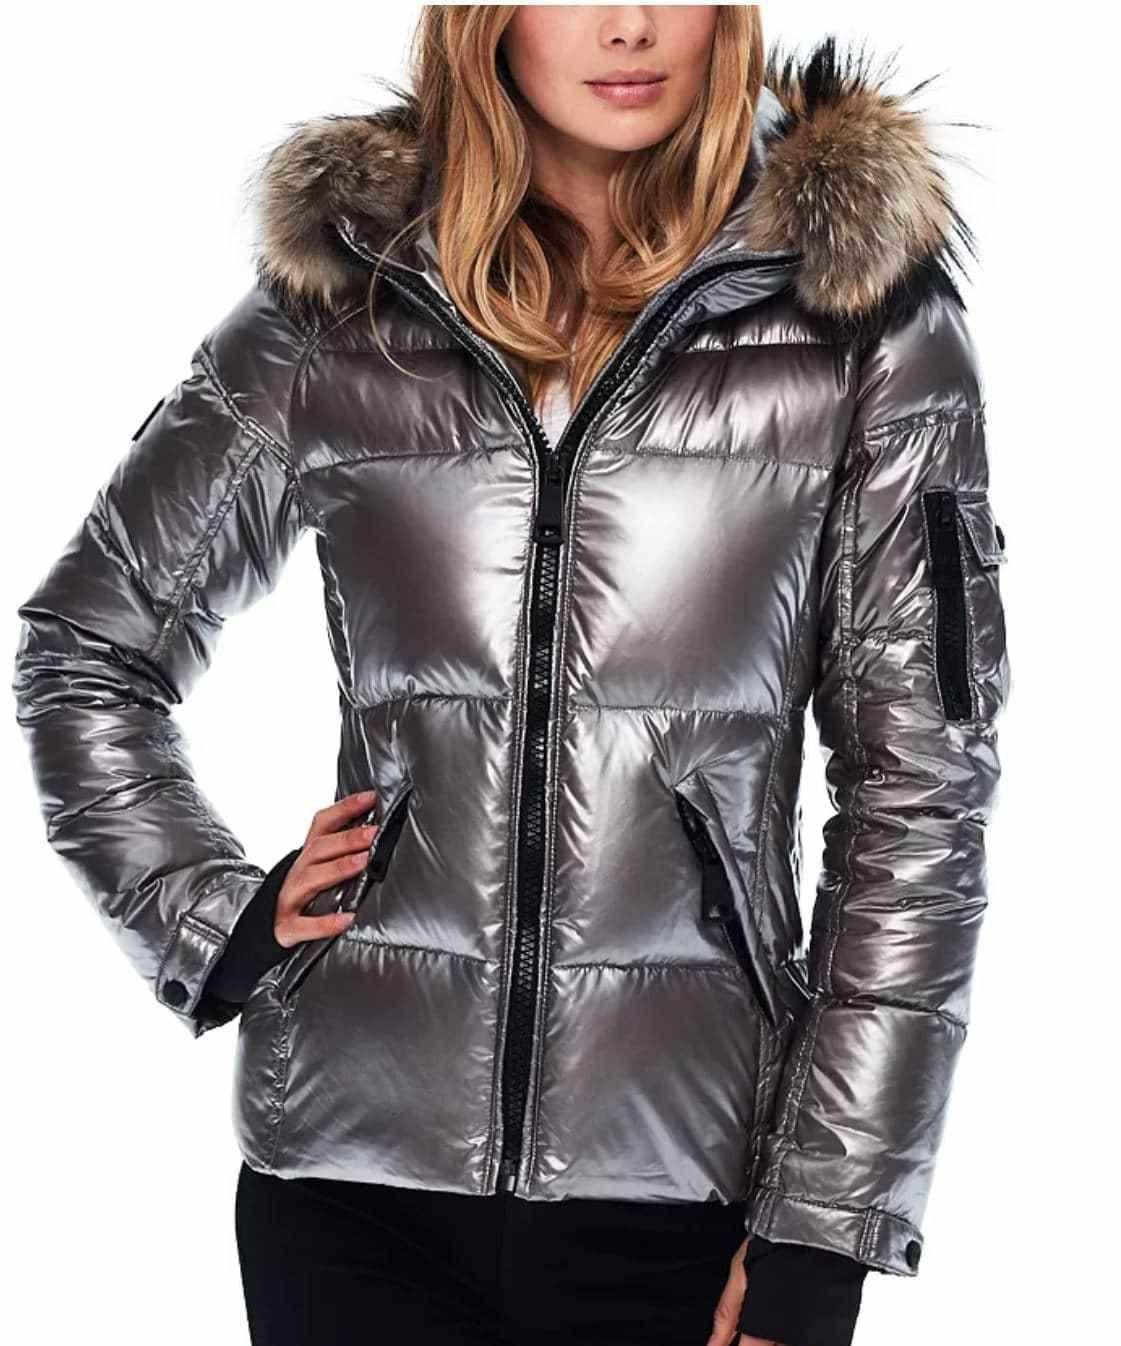 Sam Blake Down Jacket Today S Fashion Item Down Jacket Down Coat Puffer Jacket Women [ 1346 x 1121 Pixel ]